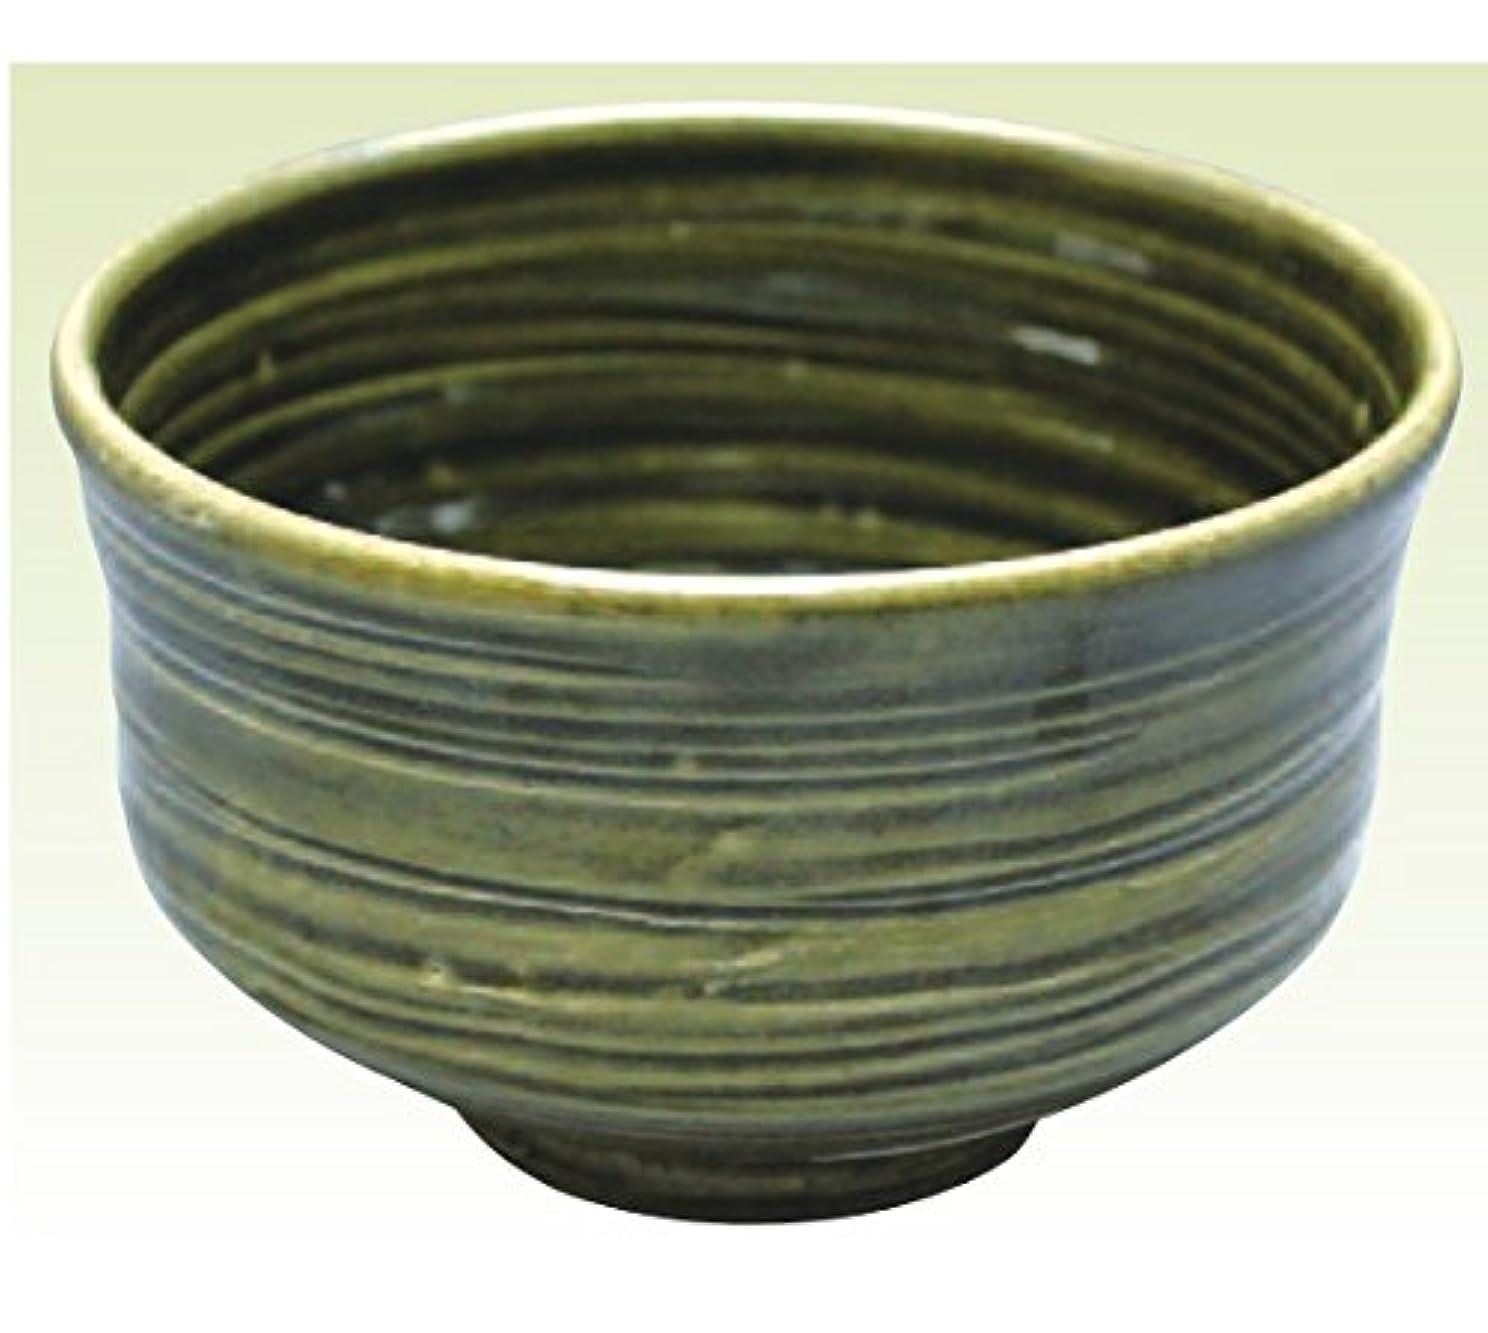 捕虜貫通アコード常滑焼 焜清作 抹茶茶碗織部径13×高さ8cm